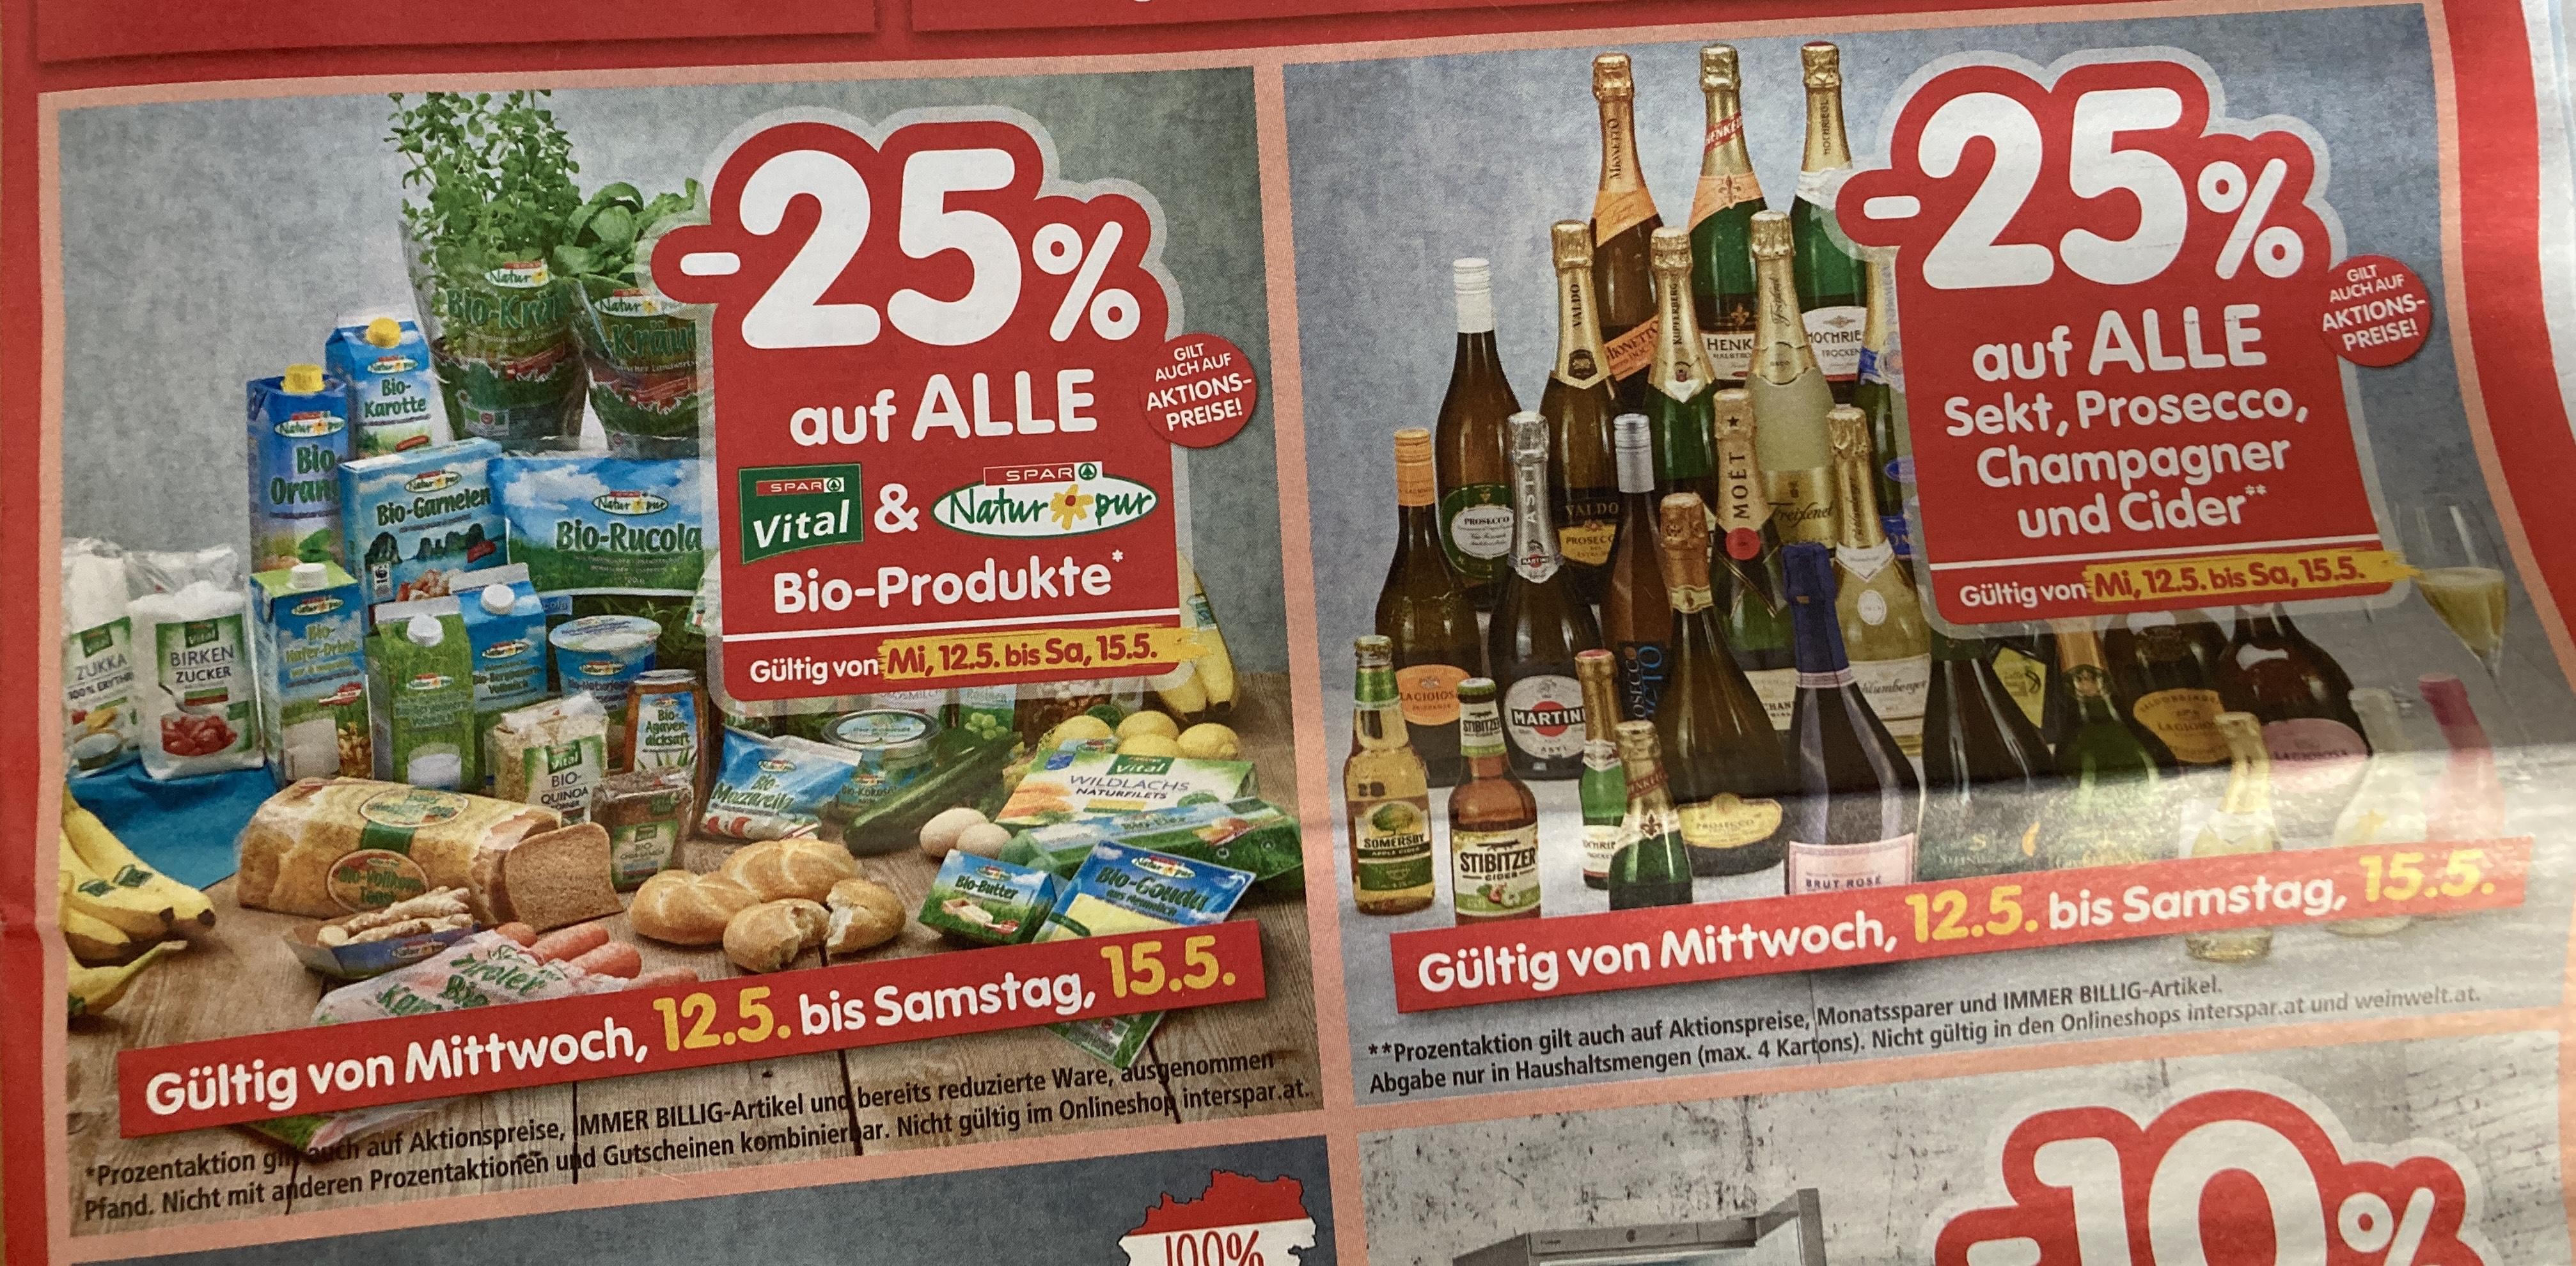 "INTERSPAR - 25% auf alle ""Spar Vital"" & ""Spar Natur pur"" Produkte & alle Sekt, Prosecco, Champagner und Cider"